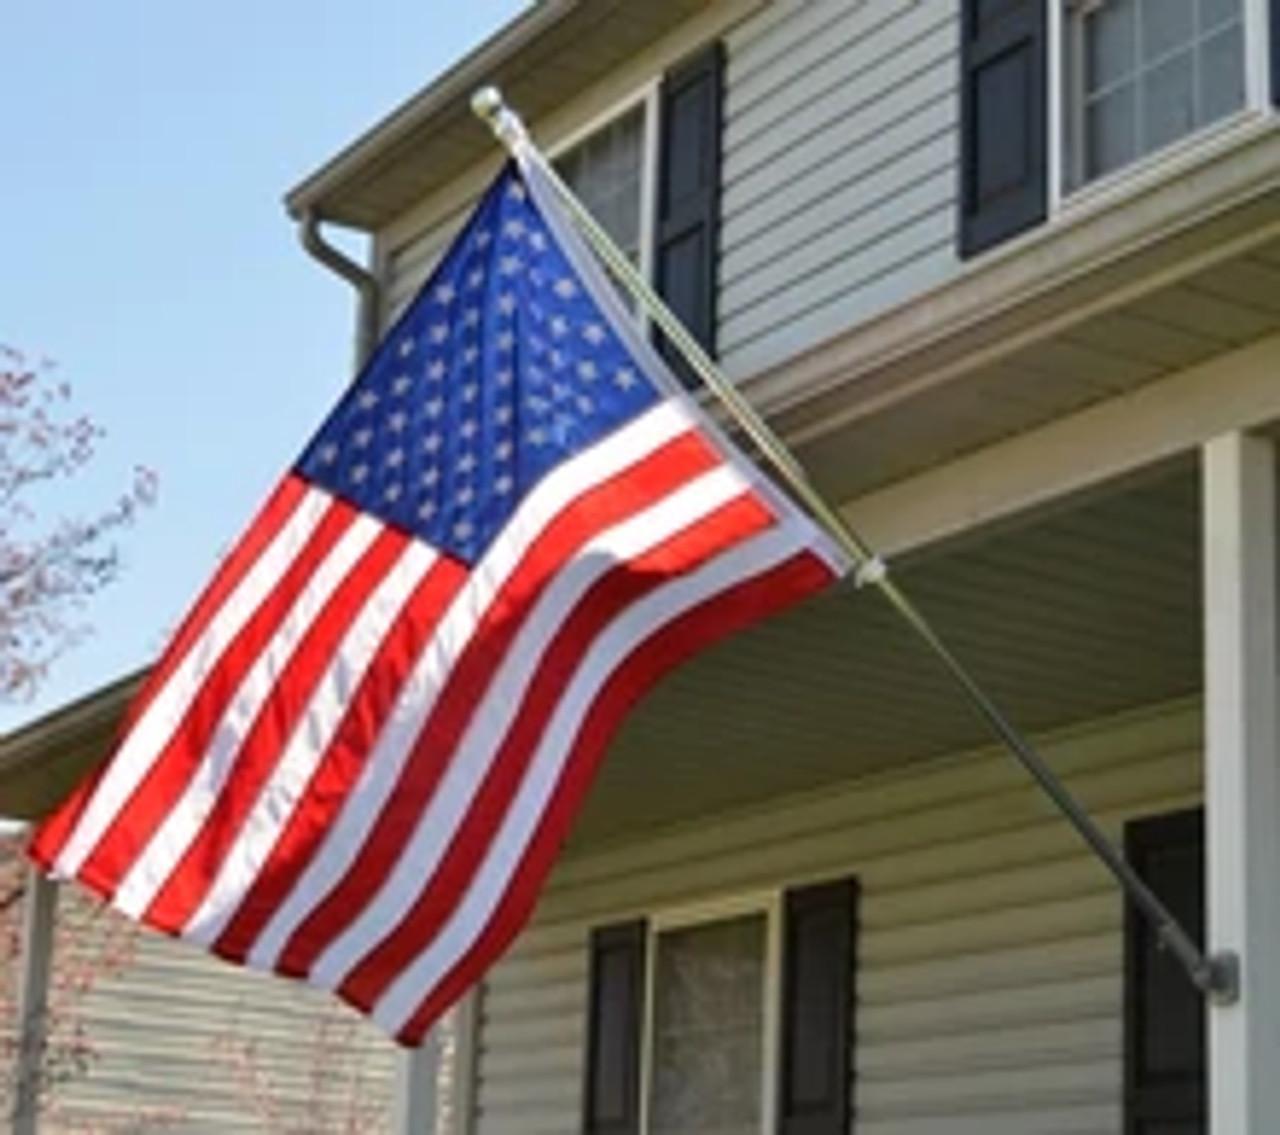 Tangle Free Flag Pole 6ft SILVER